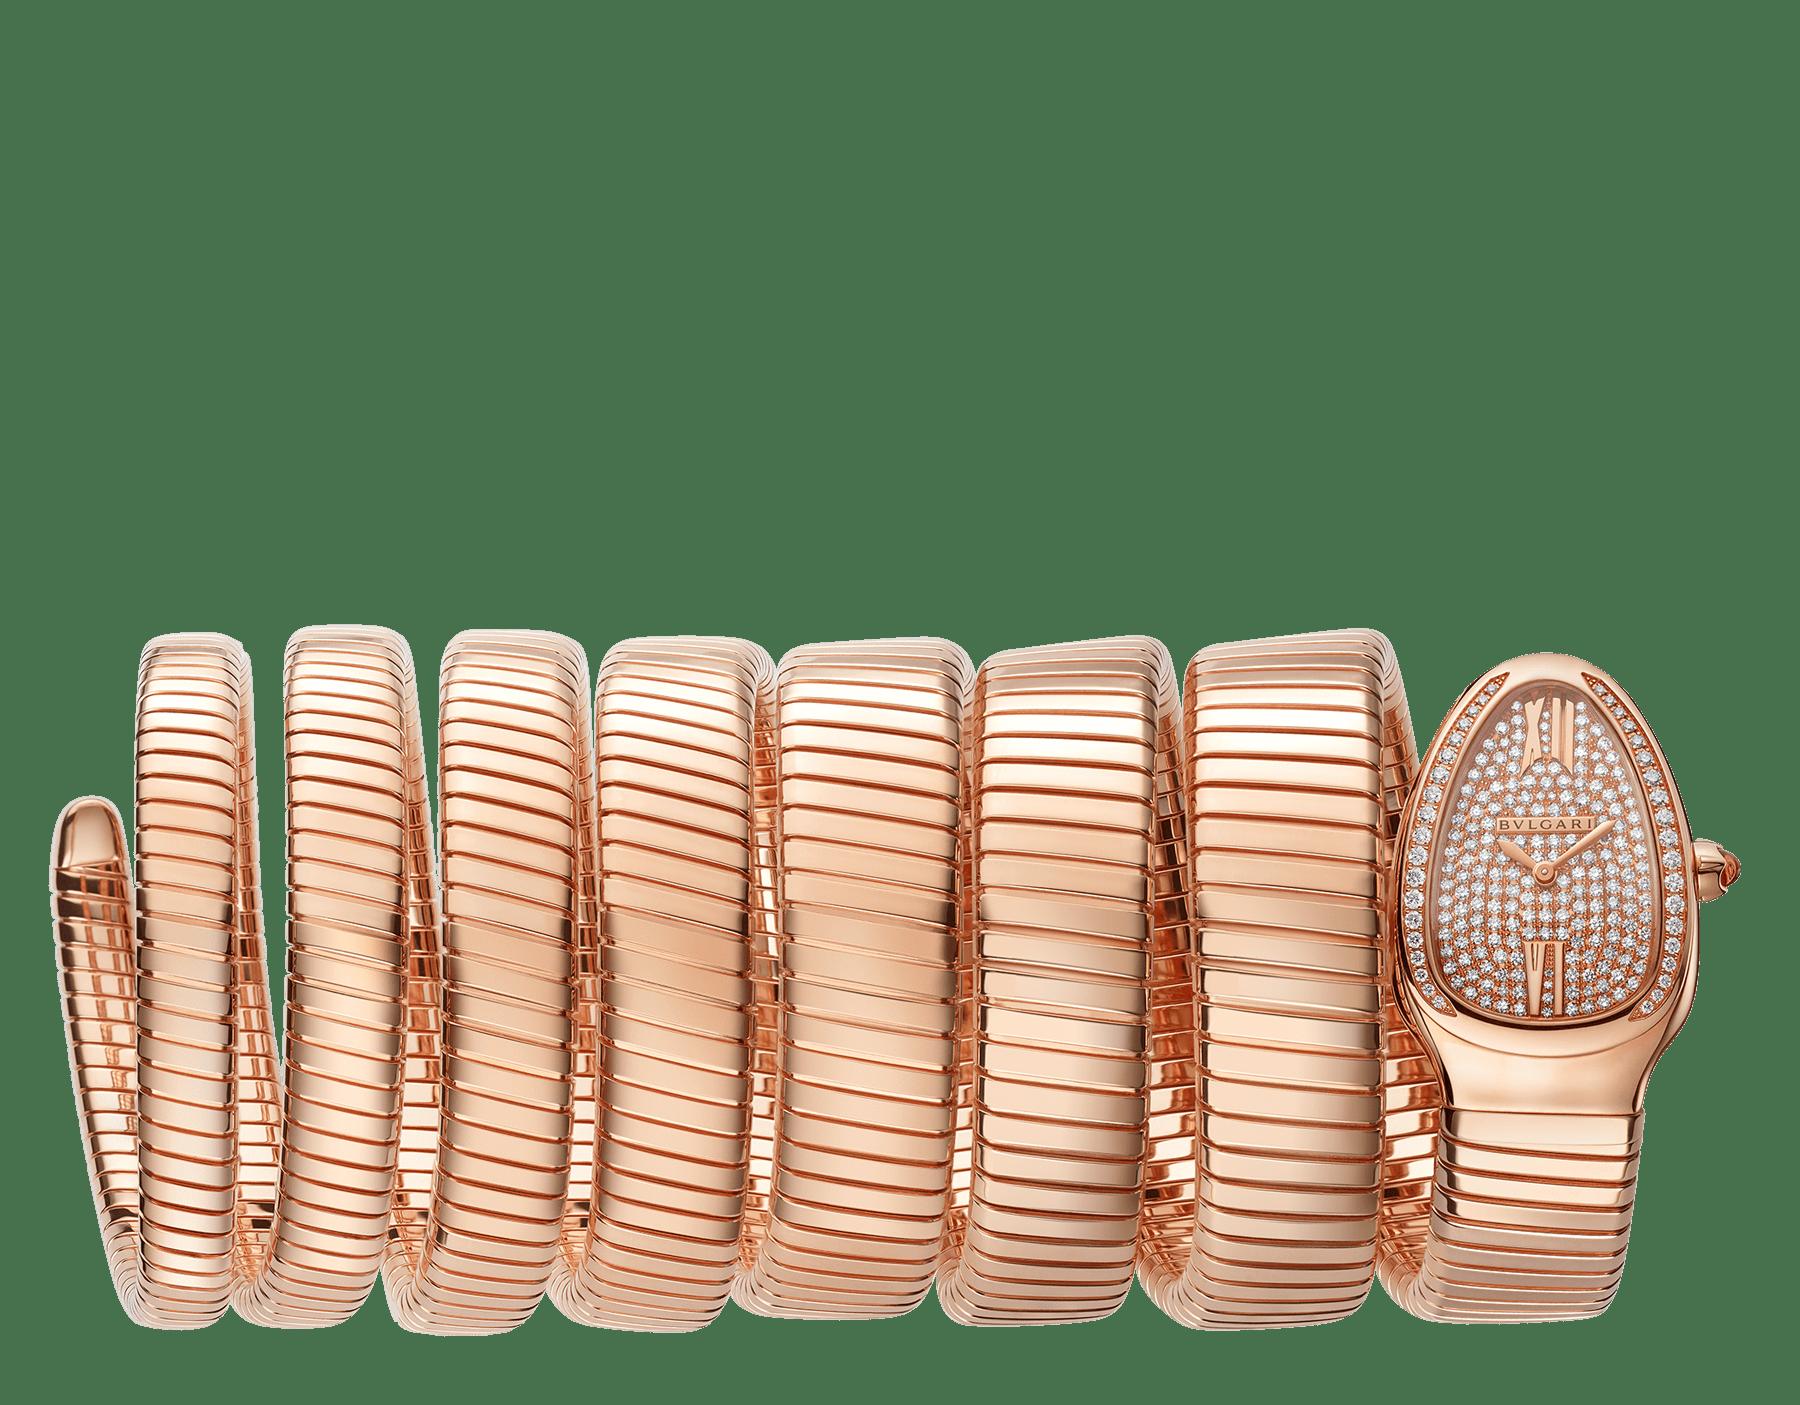 Serpenti Tubogas 七圈螺旋腕錶,18K 玫瑰金錶殼鑲飾明亮型切割鑽石,18K 玫瑰金錶盤鑲飾全密鑲明亮型切割鑽石,18K 玫瑰金錶帶。 101938 image 1